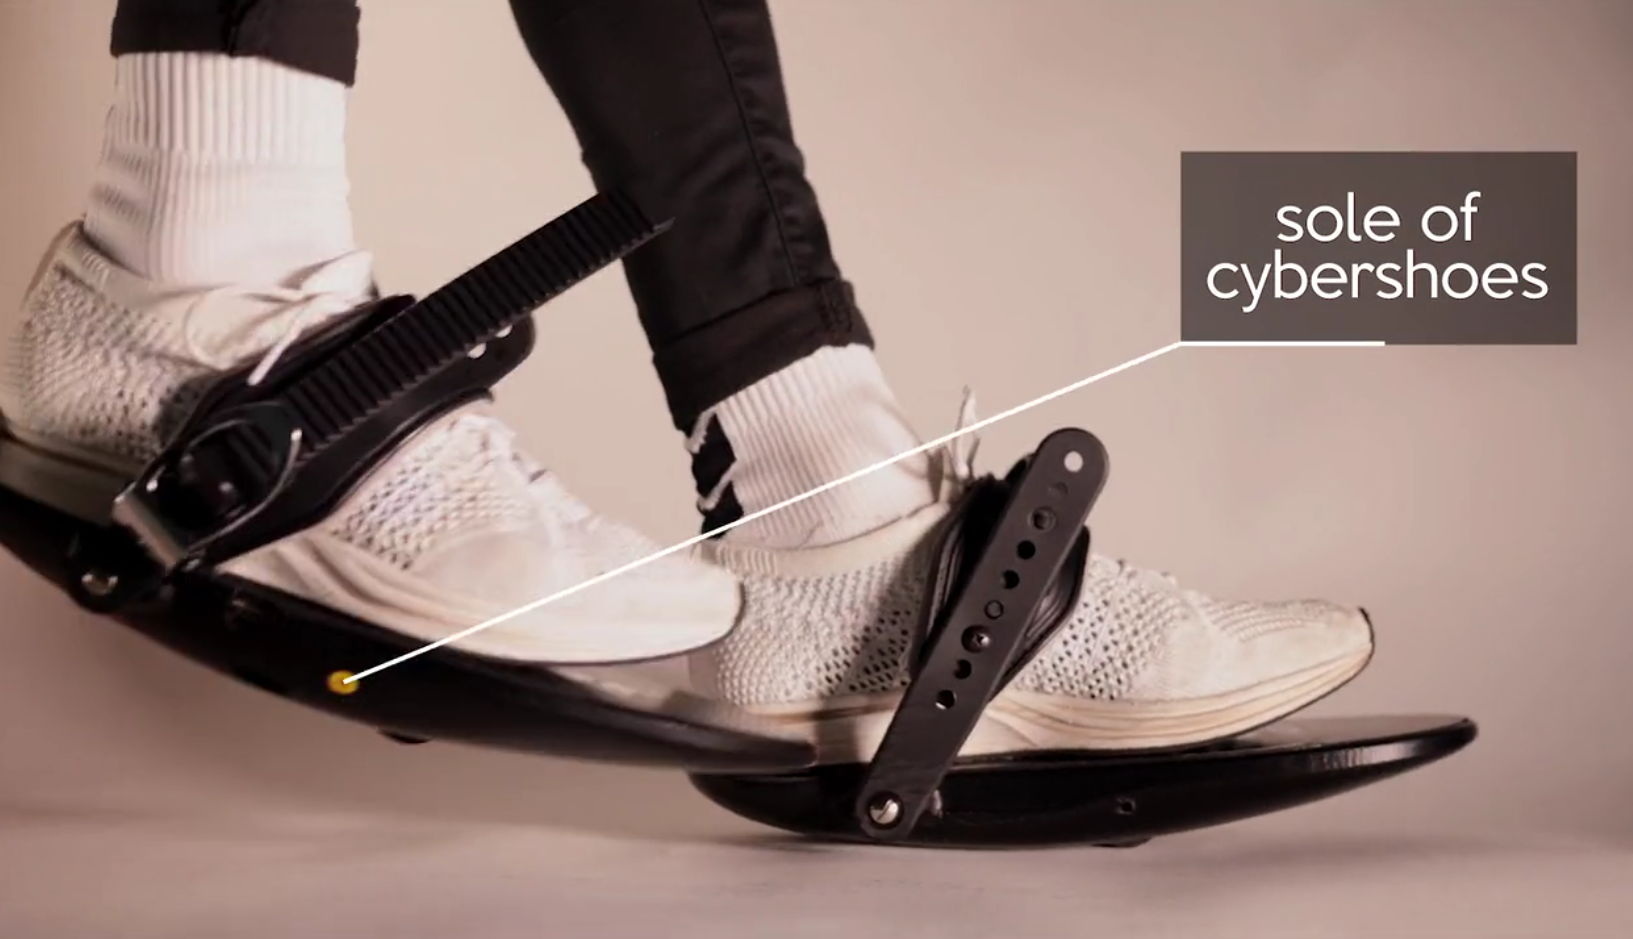 https www 3dvf com actualite 24463 crowdfunding cybershoes semelles se deplacer en realite virtuelle html